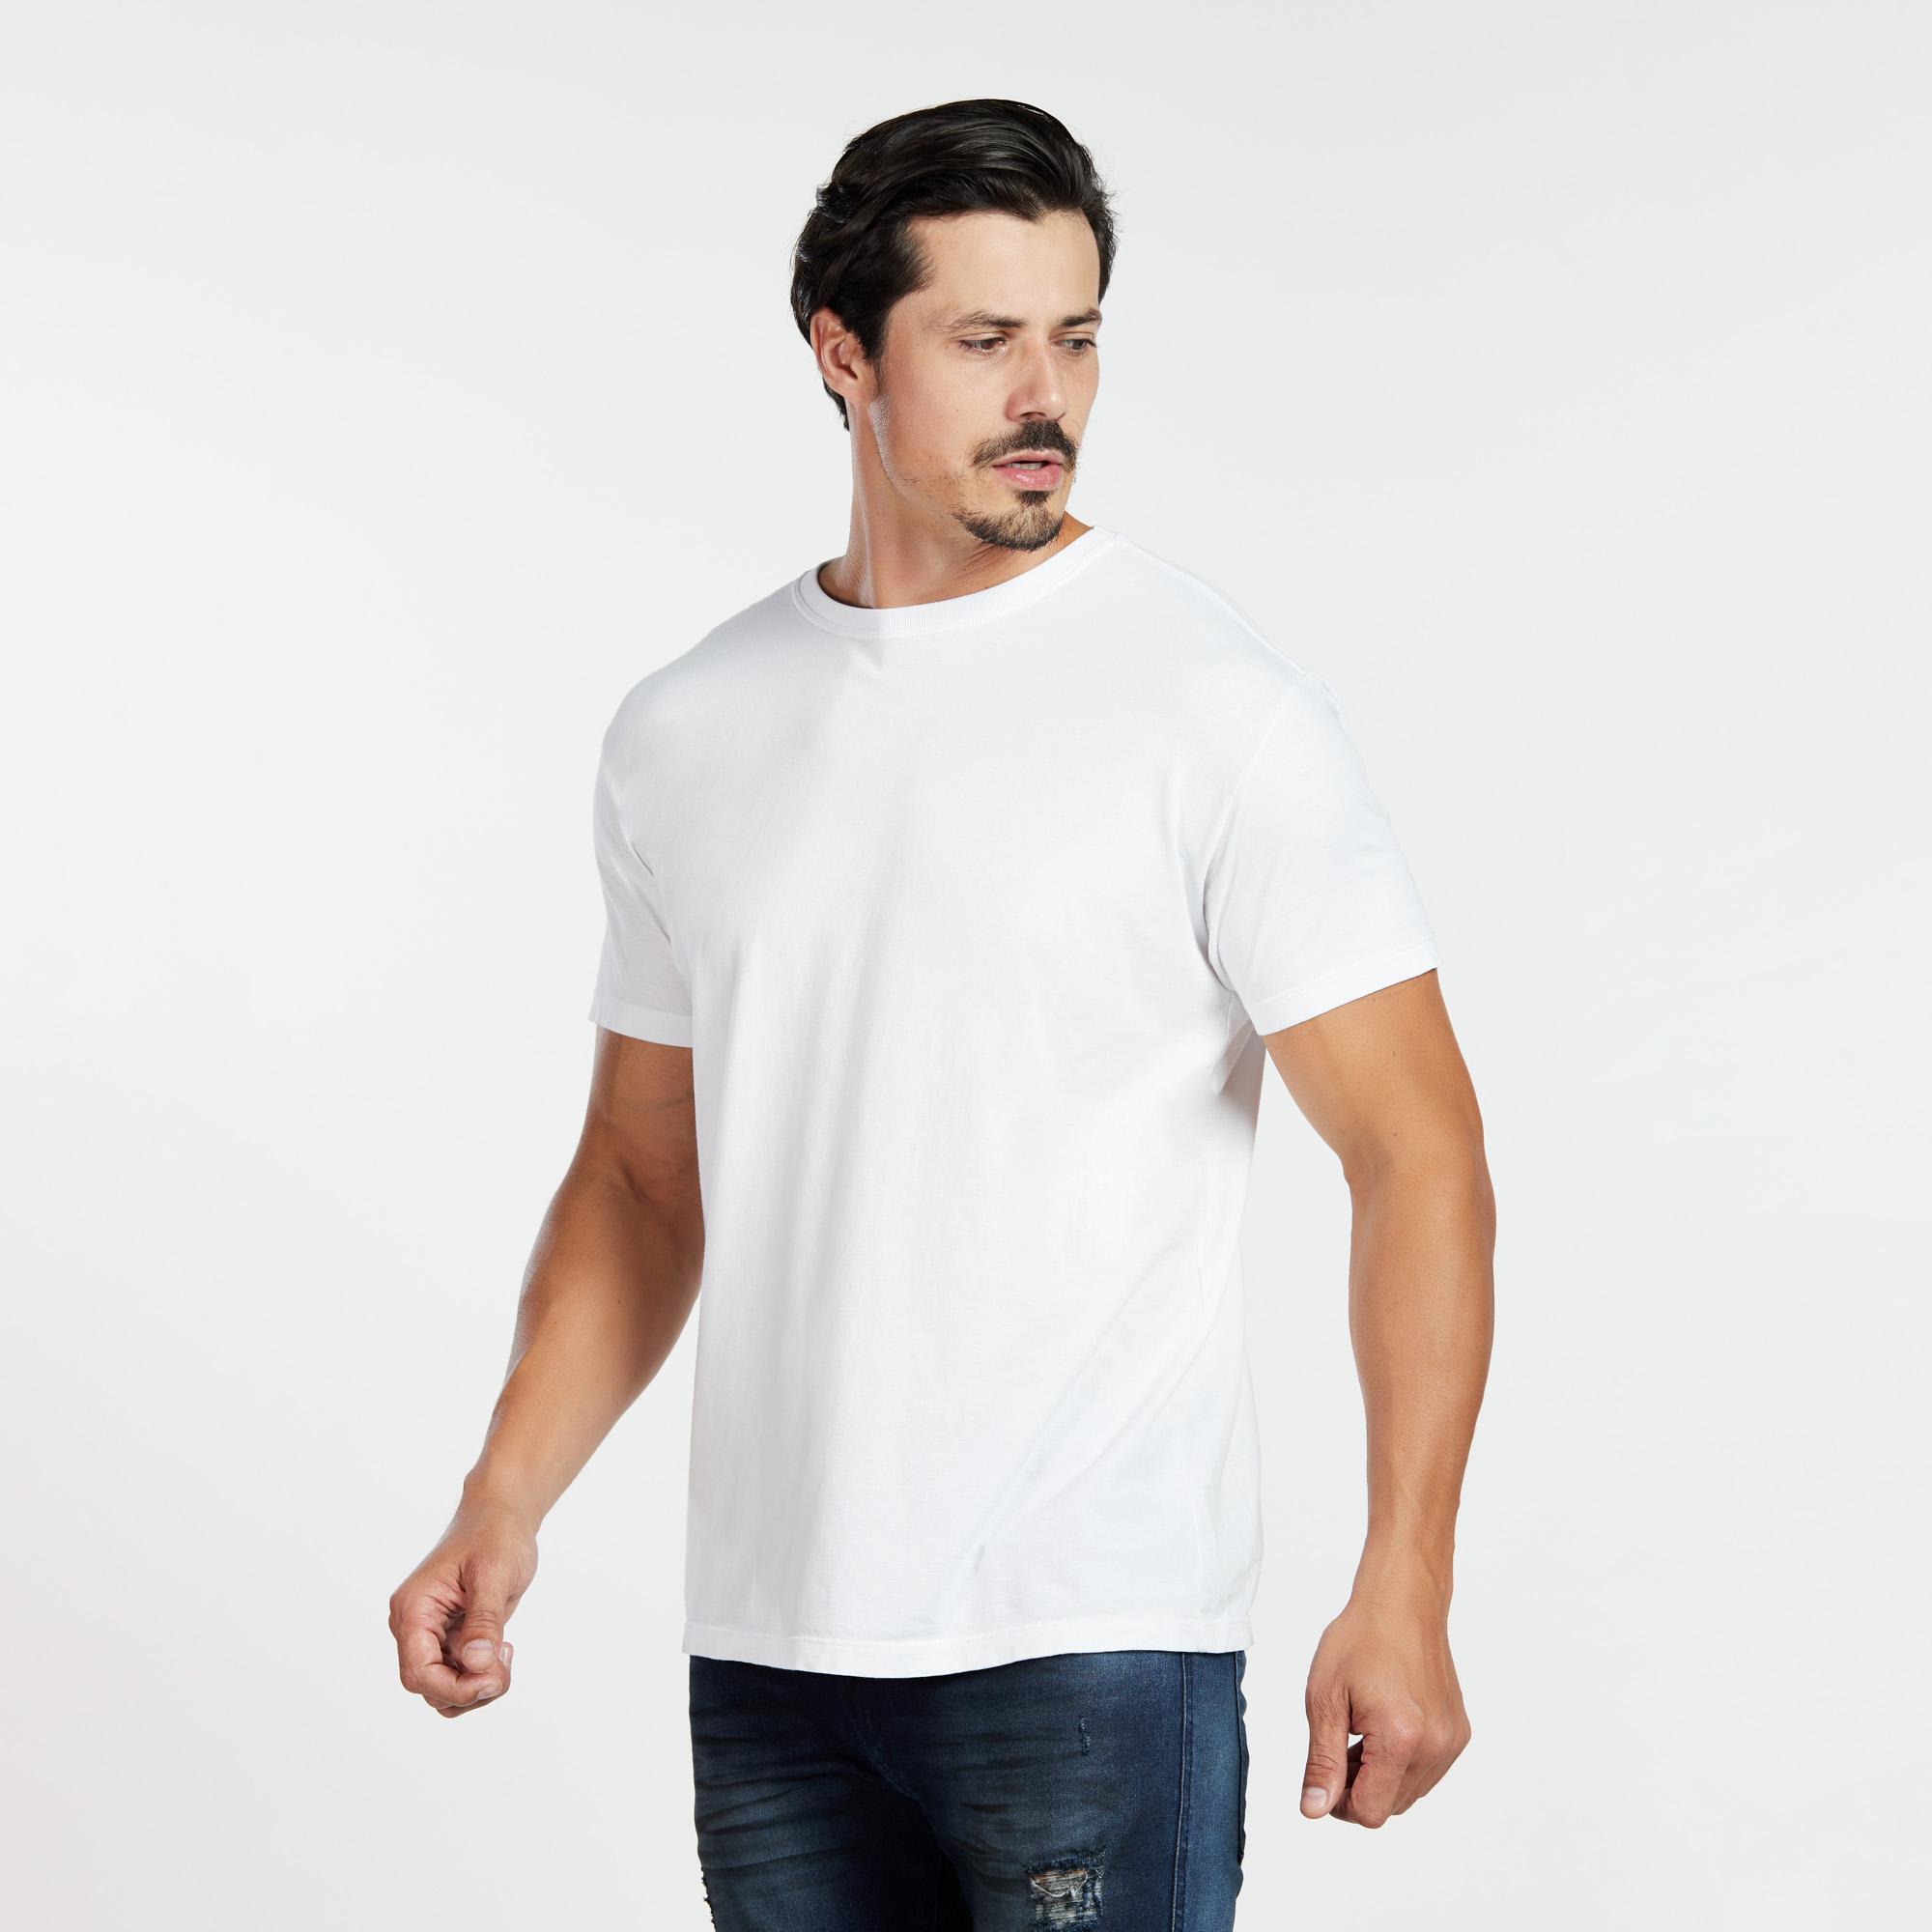 Camiseta Masculina Reativo Branca